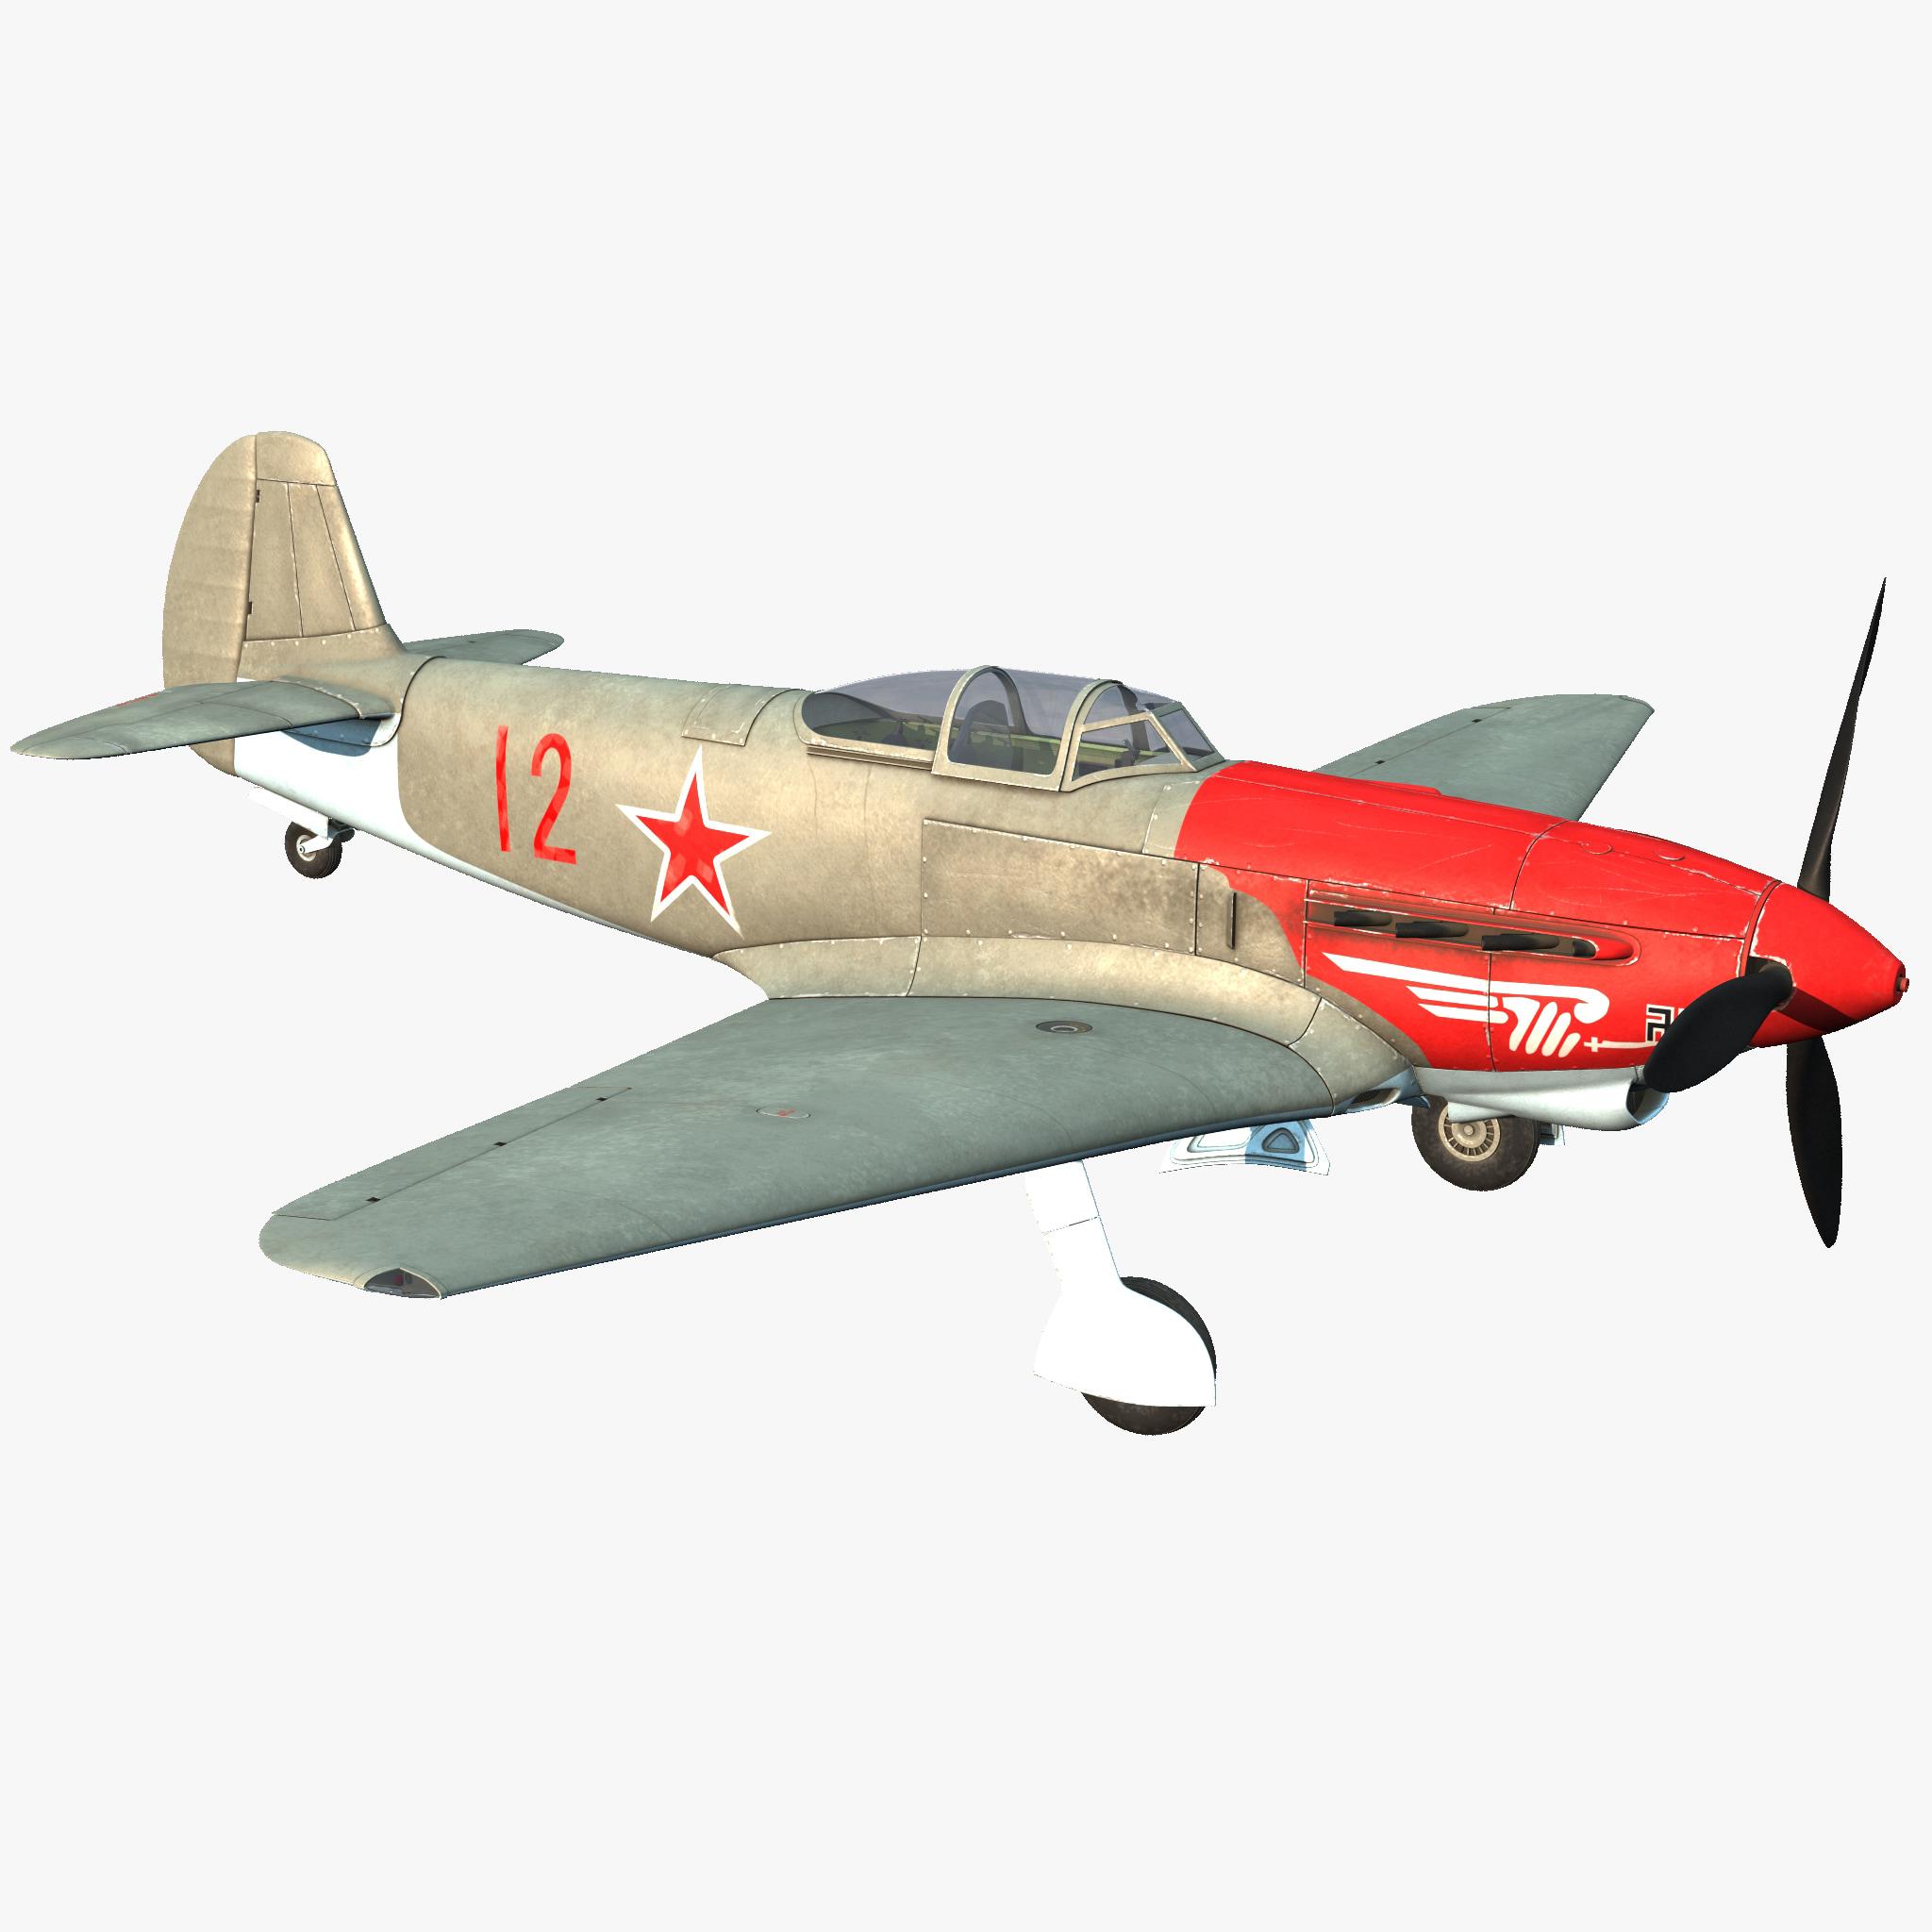 Yakovlev Yak-9 Soviet World War II Fighter_164.jpg